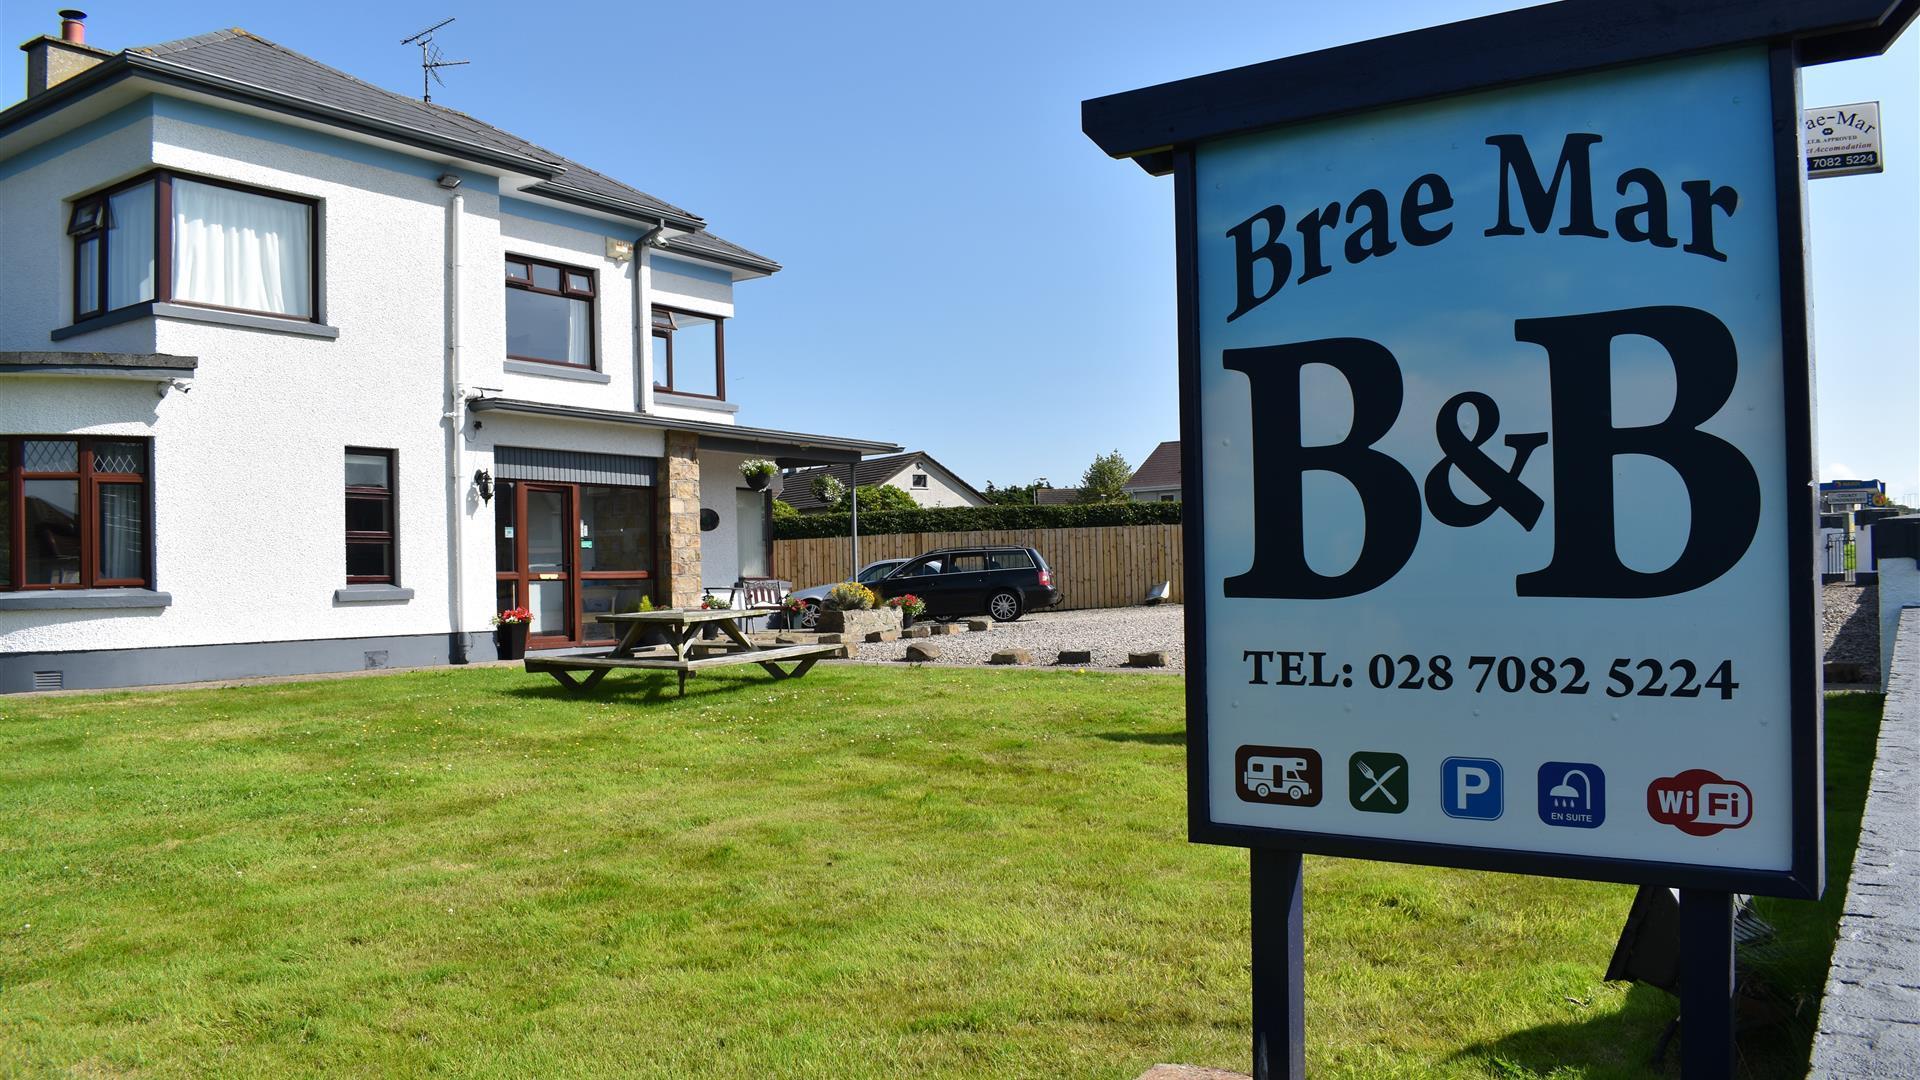 Brae Mar